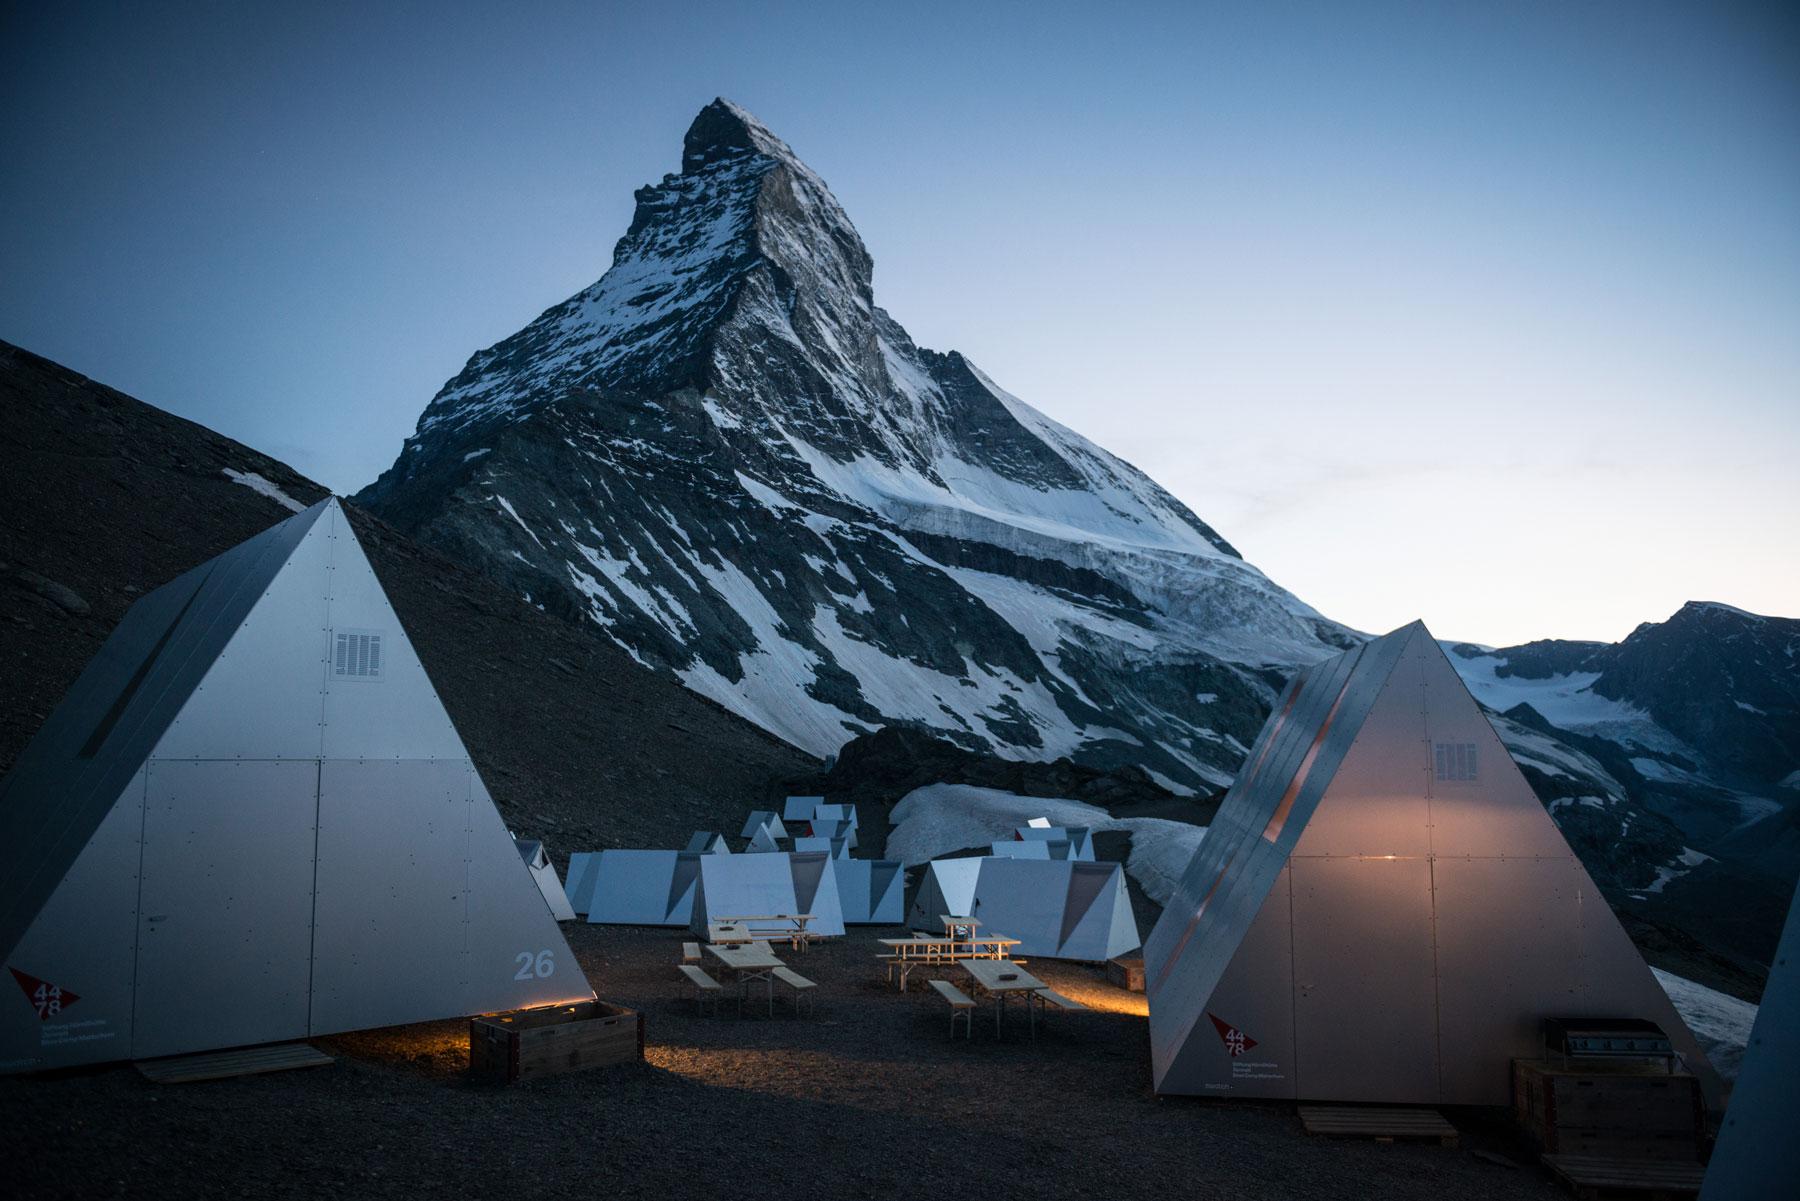 Matterhorn Kronig